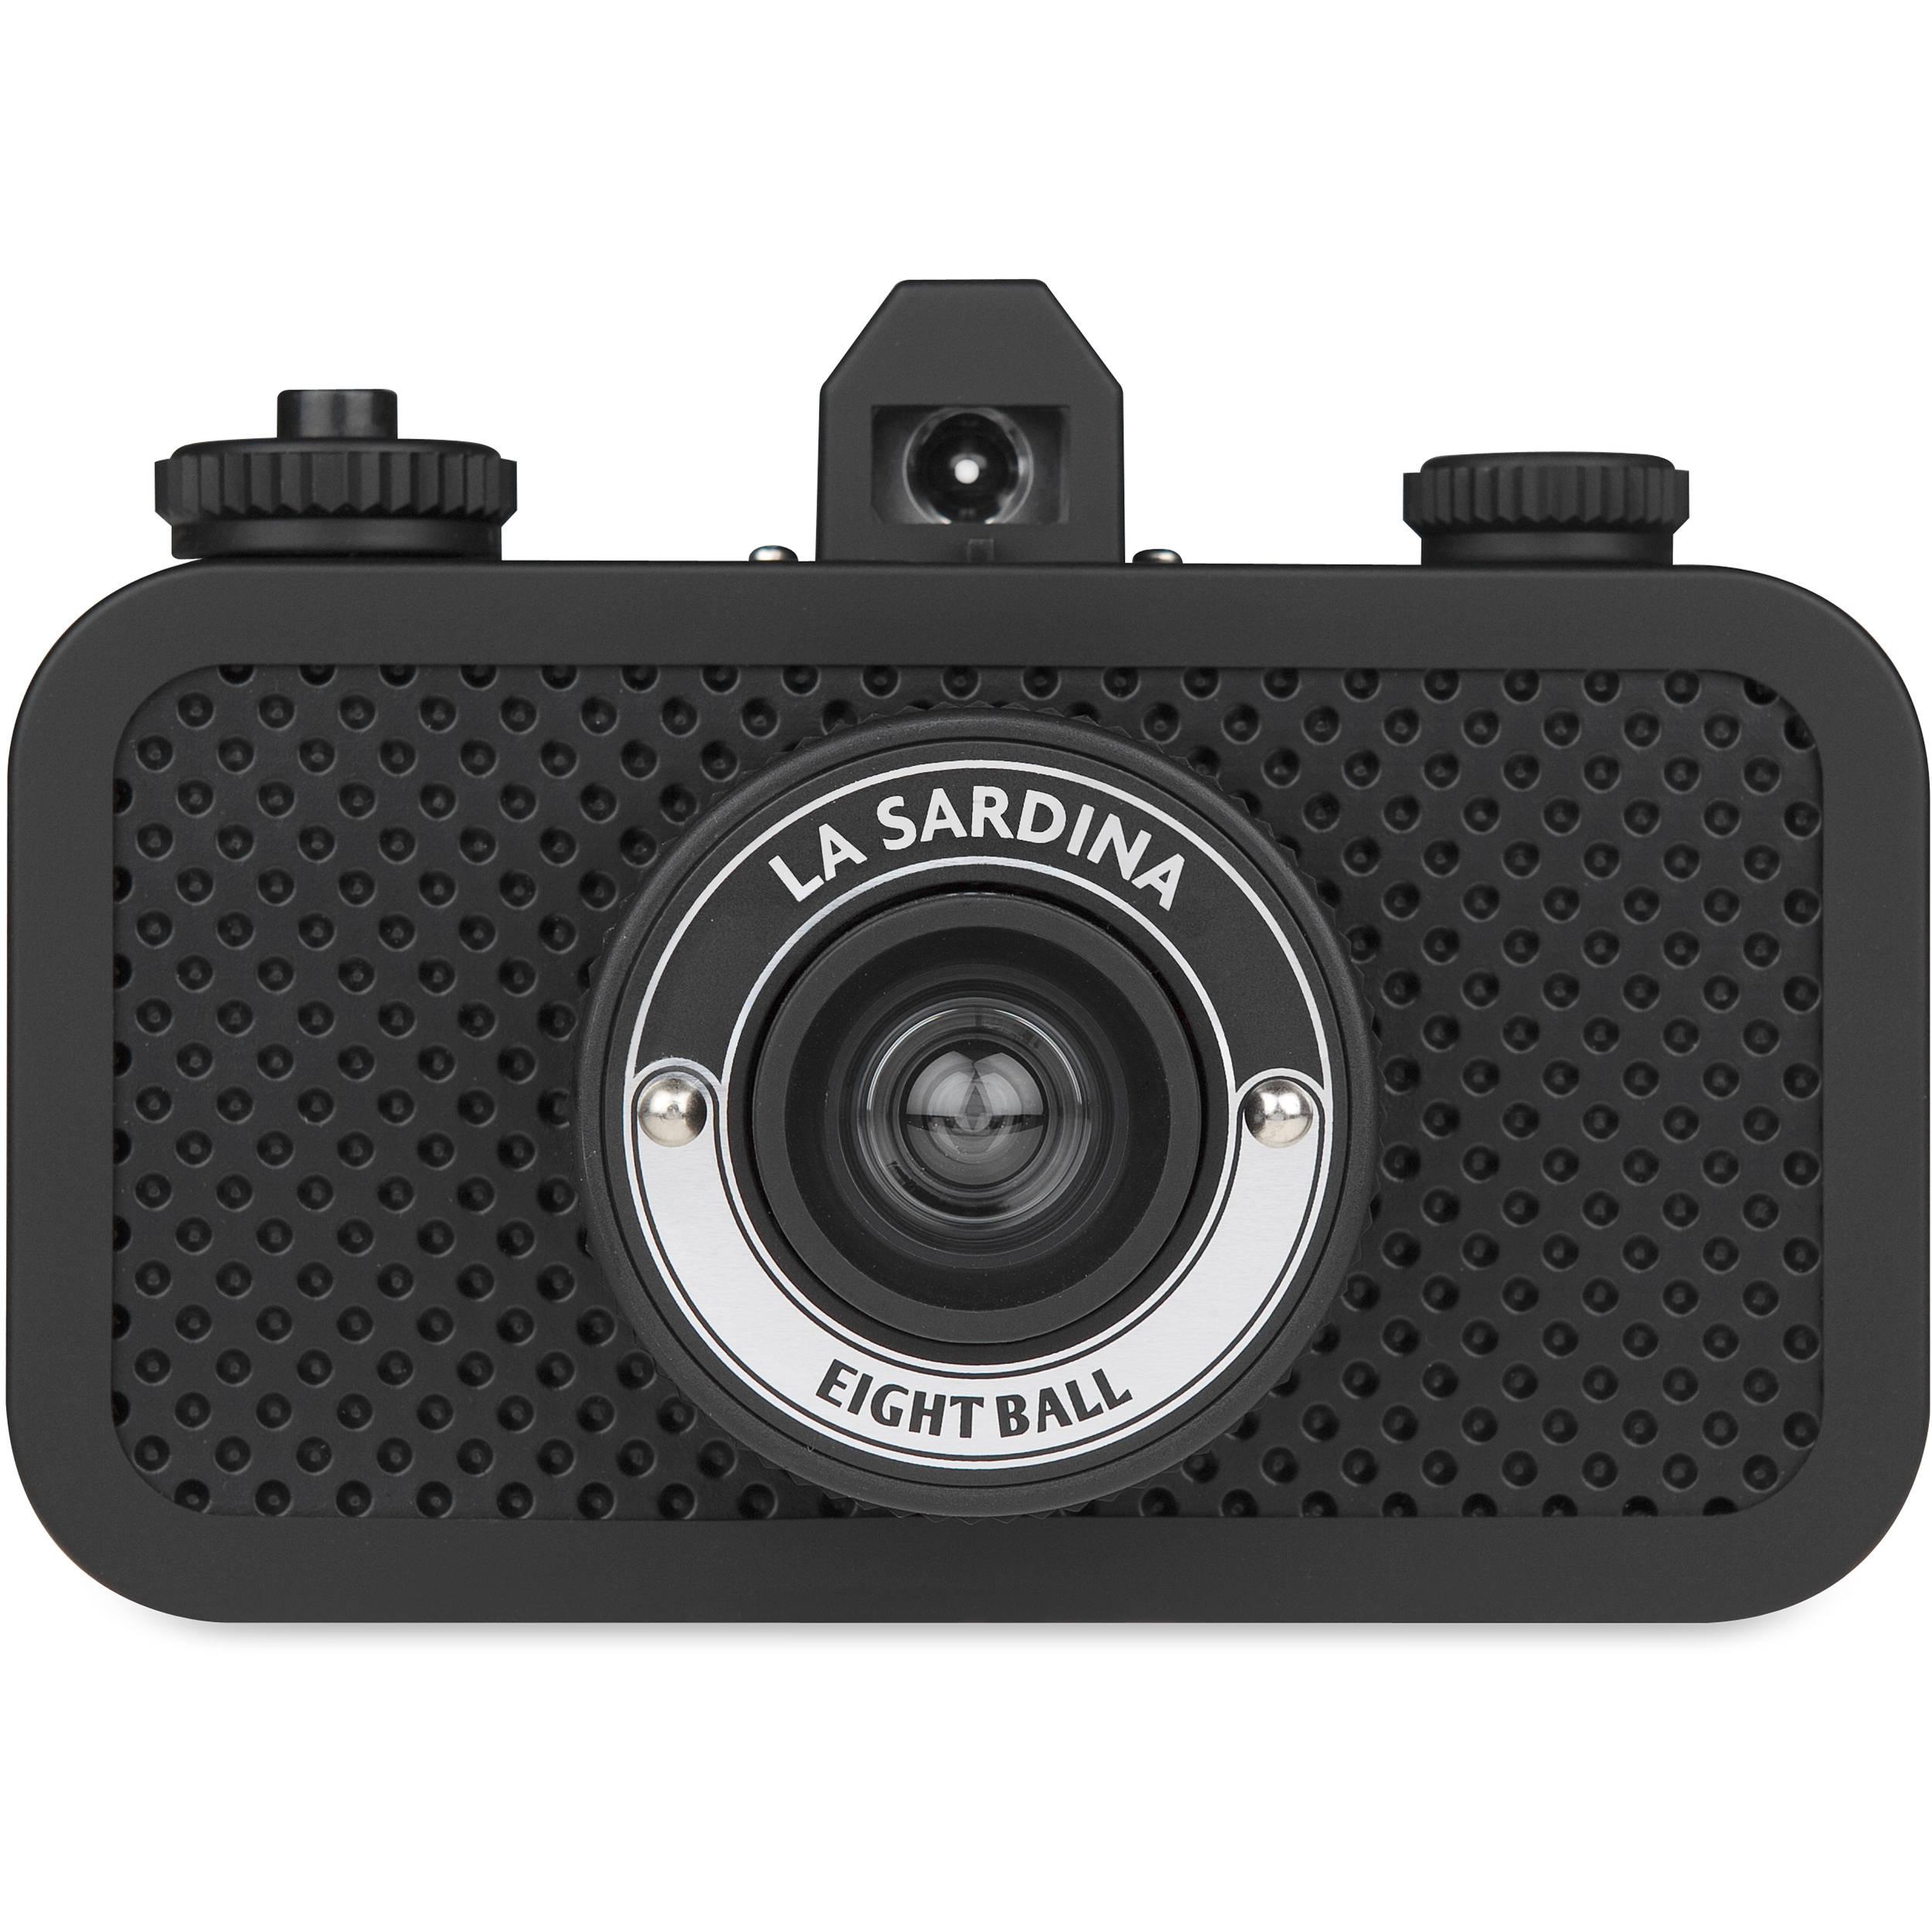 Lomography La Sardina 8Ball Camera SP100AB B&H Photo Video